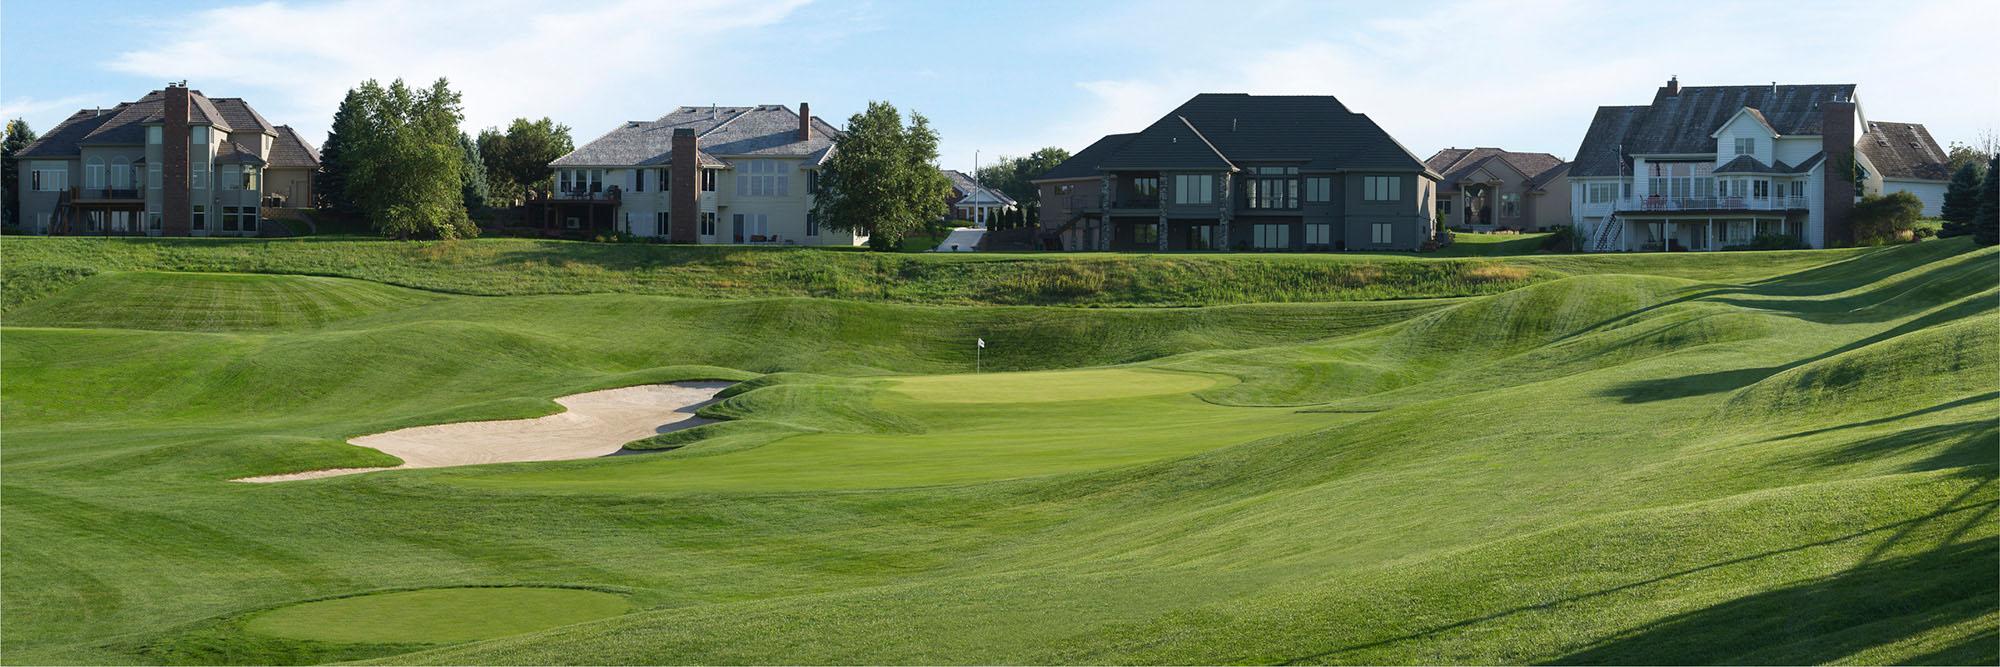 Golf Course Image - Champions Run No. 16